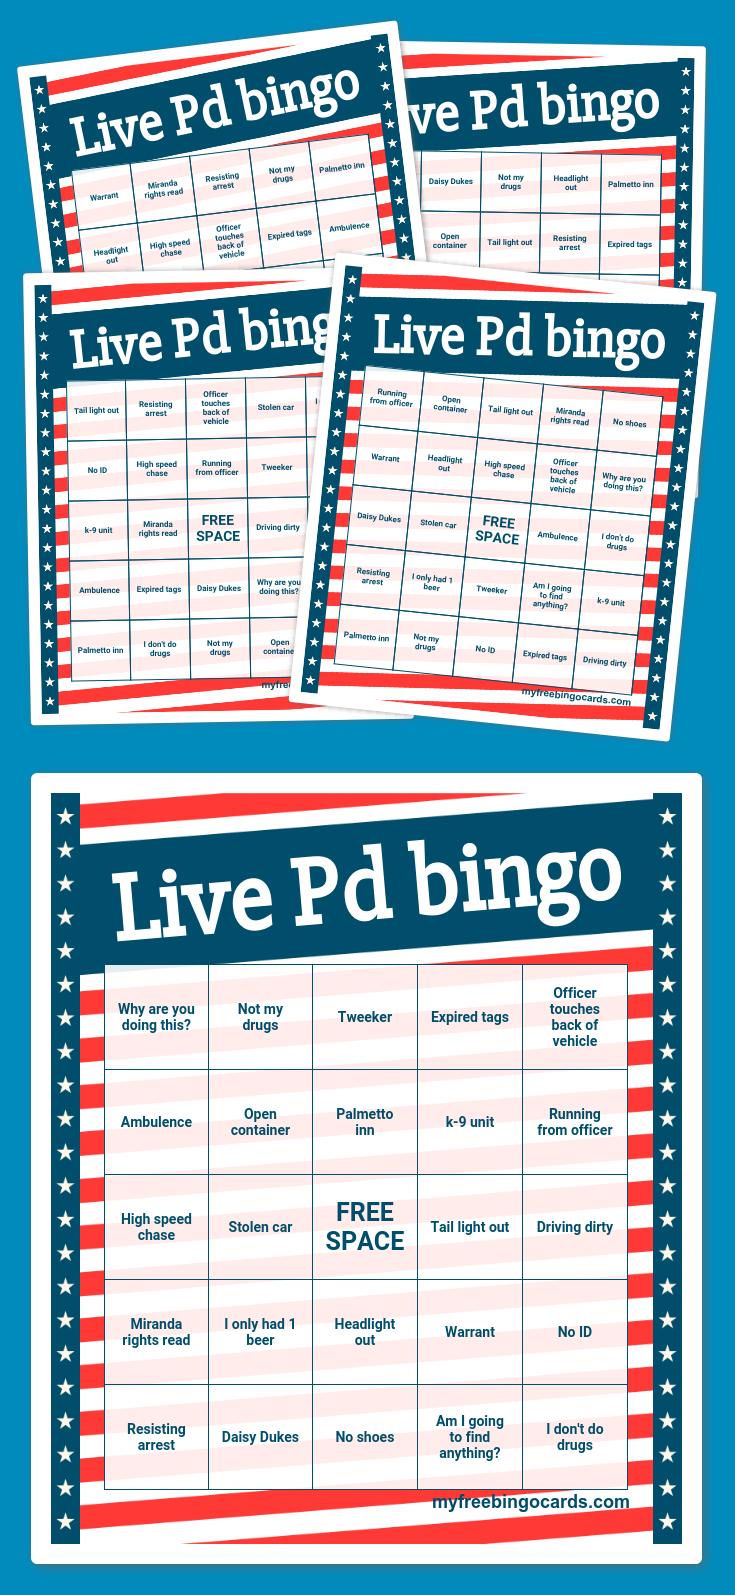 Live Pd bingo Bingo card generator, Bingo cards, Bingo